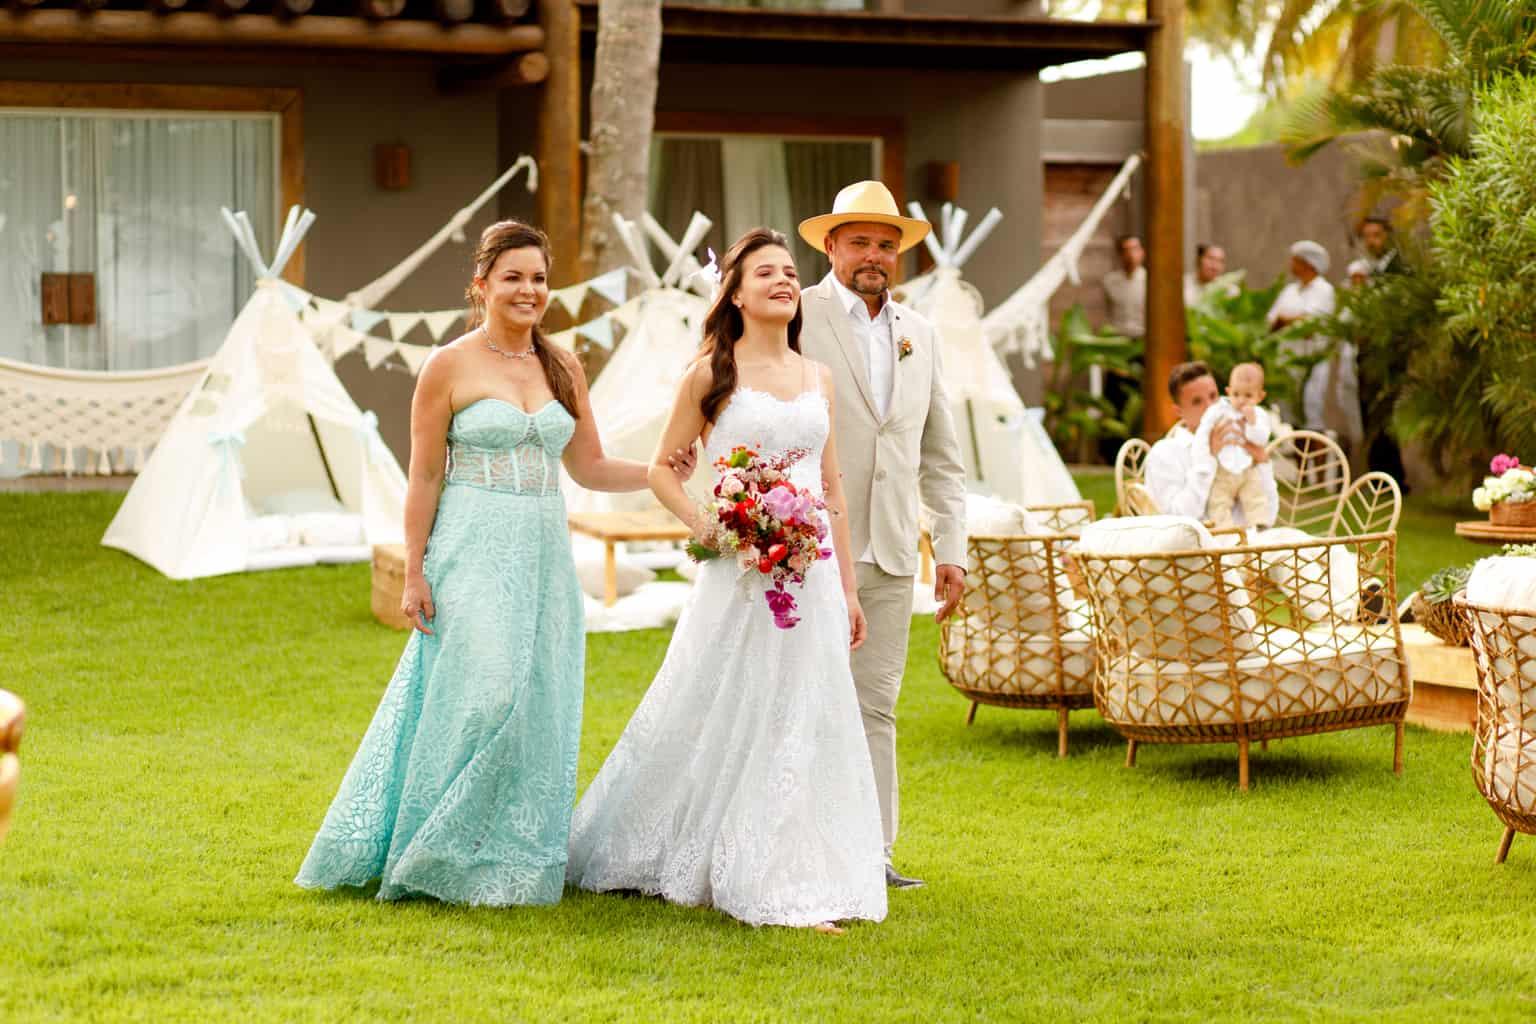 Casamento-Emanuelle-e-Alysson-Fotografia-Tadeu-Nanó-e-Luca-Antunes73